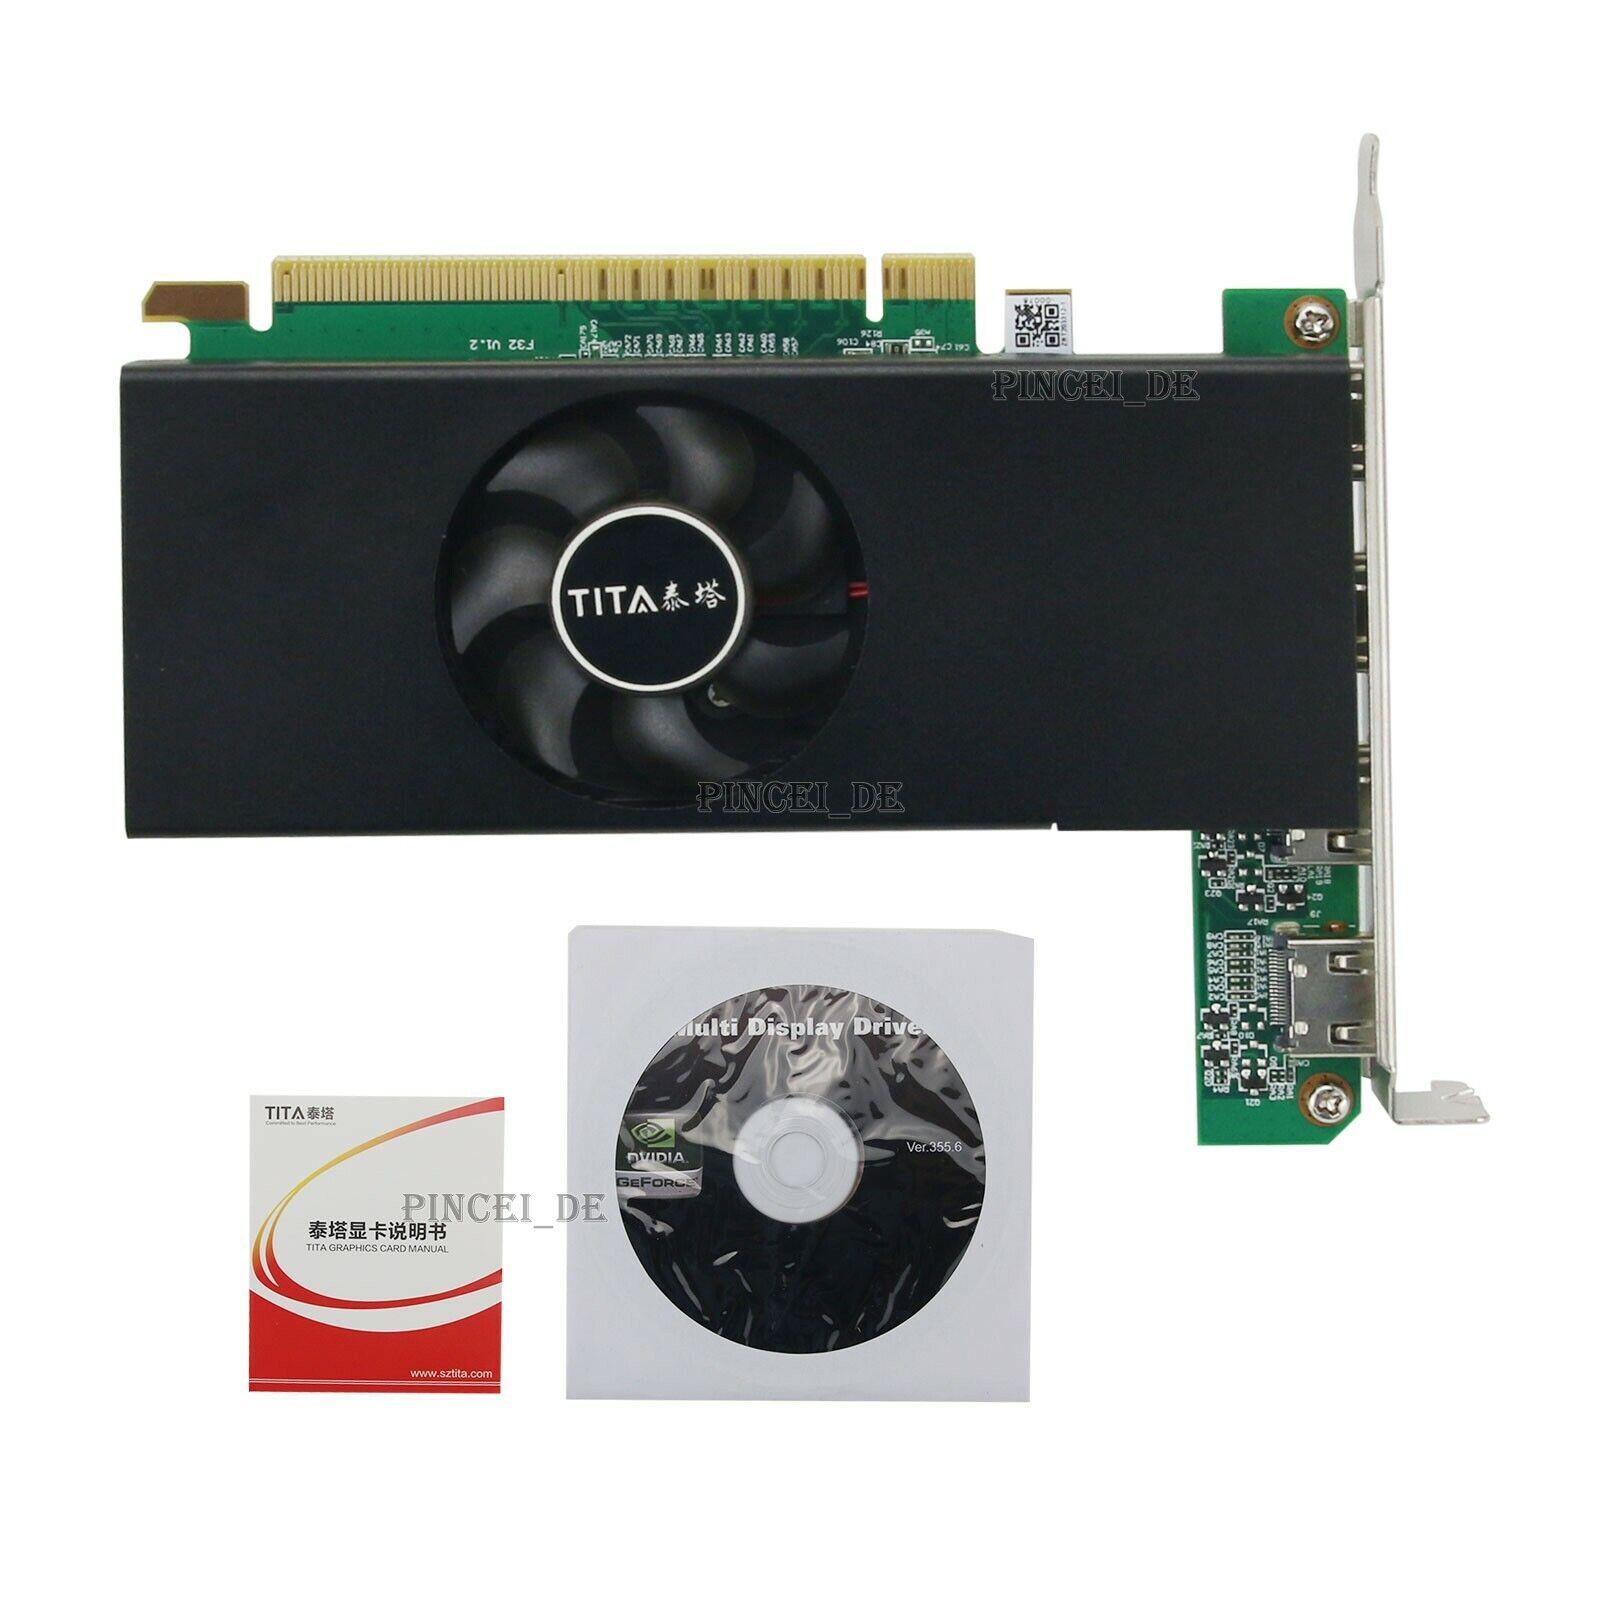 Video Card HDMI Graphics Card 4 HDMI Port 2GB DDR3 For Linux Windows 8/7/Vista